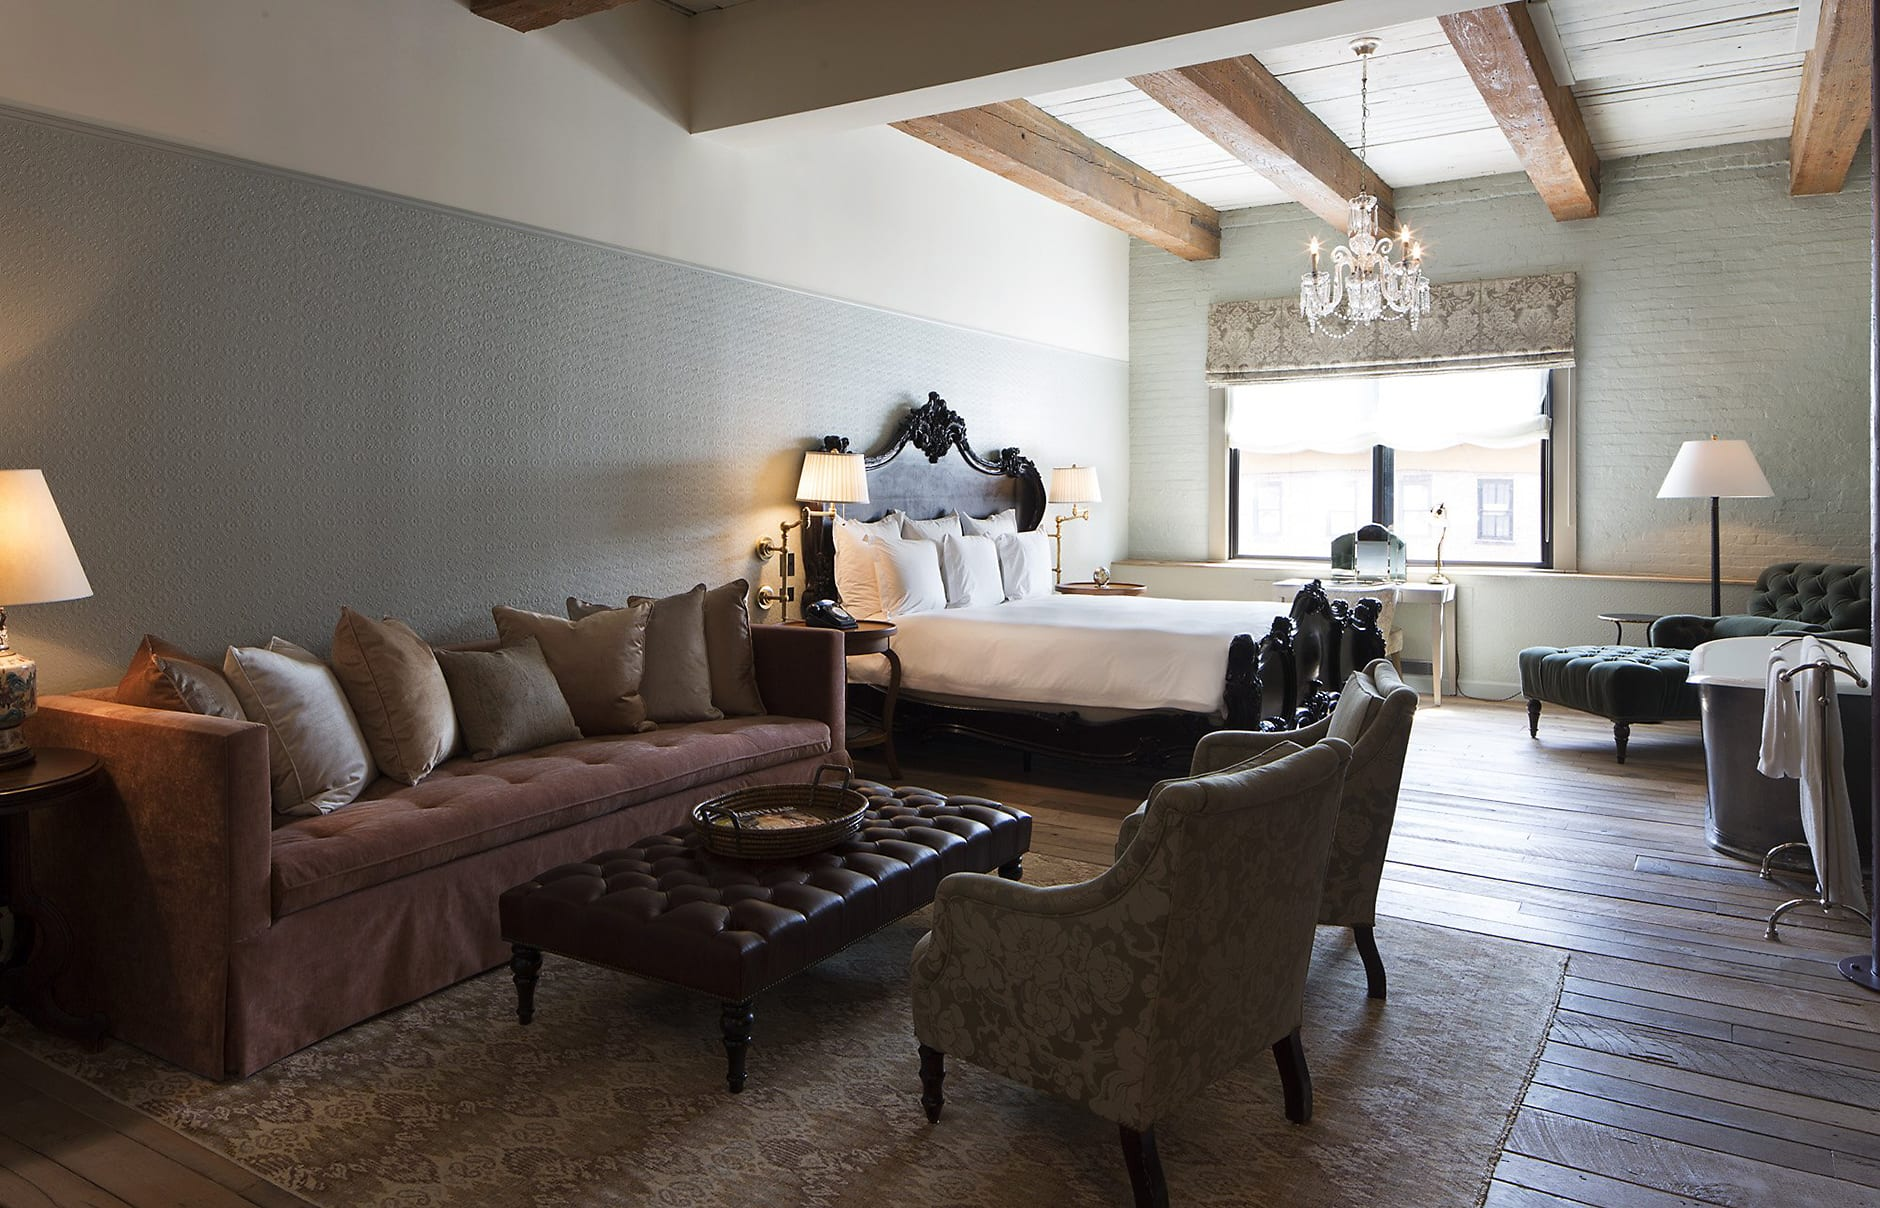 Soho house new york luxury hotels travelplusstyle - Decoration interieur new york ...